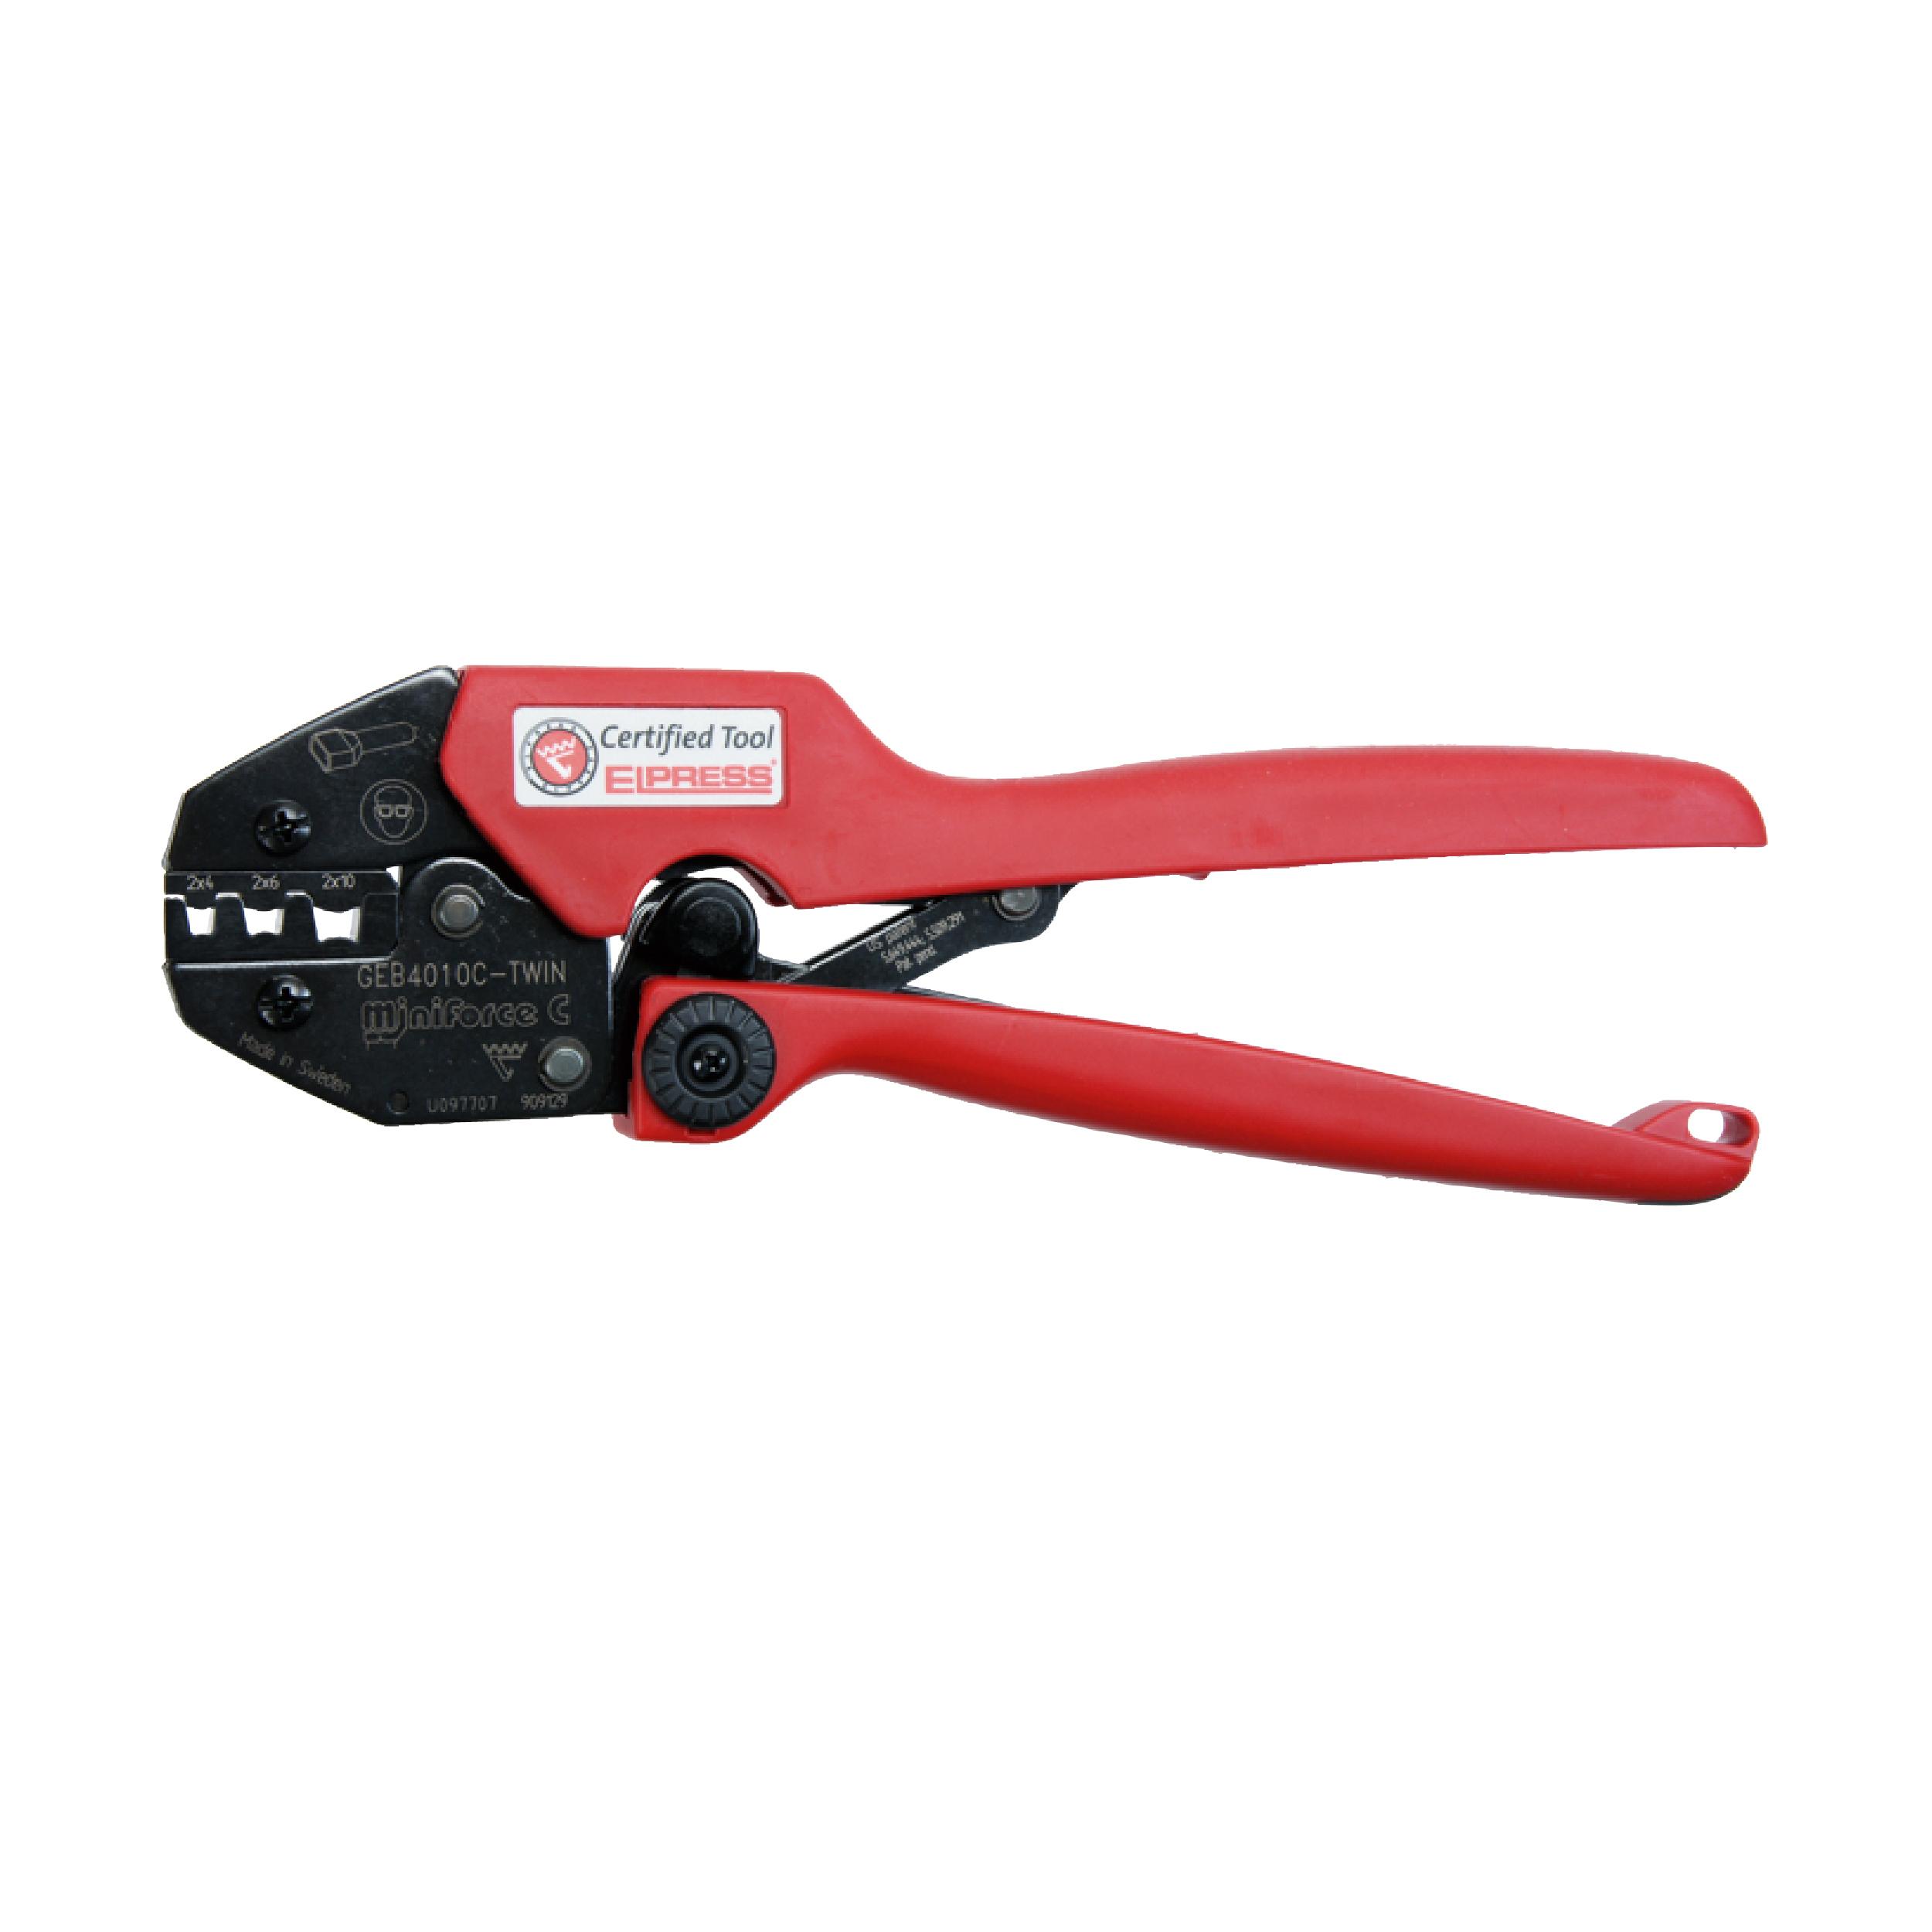 Elpress GEB4010C-TWIN Miniforce Crimping Tool (Range 4-10mm²)